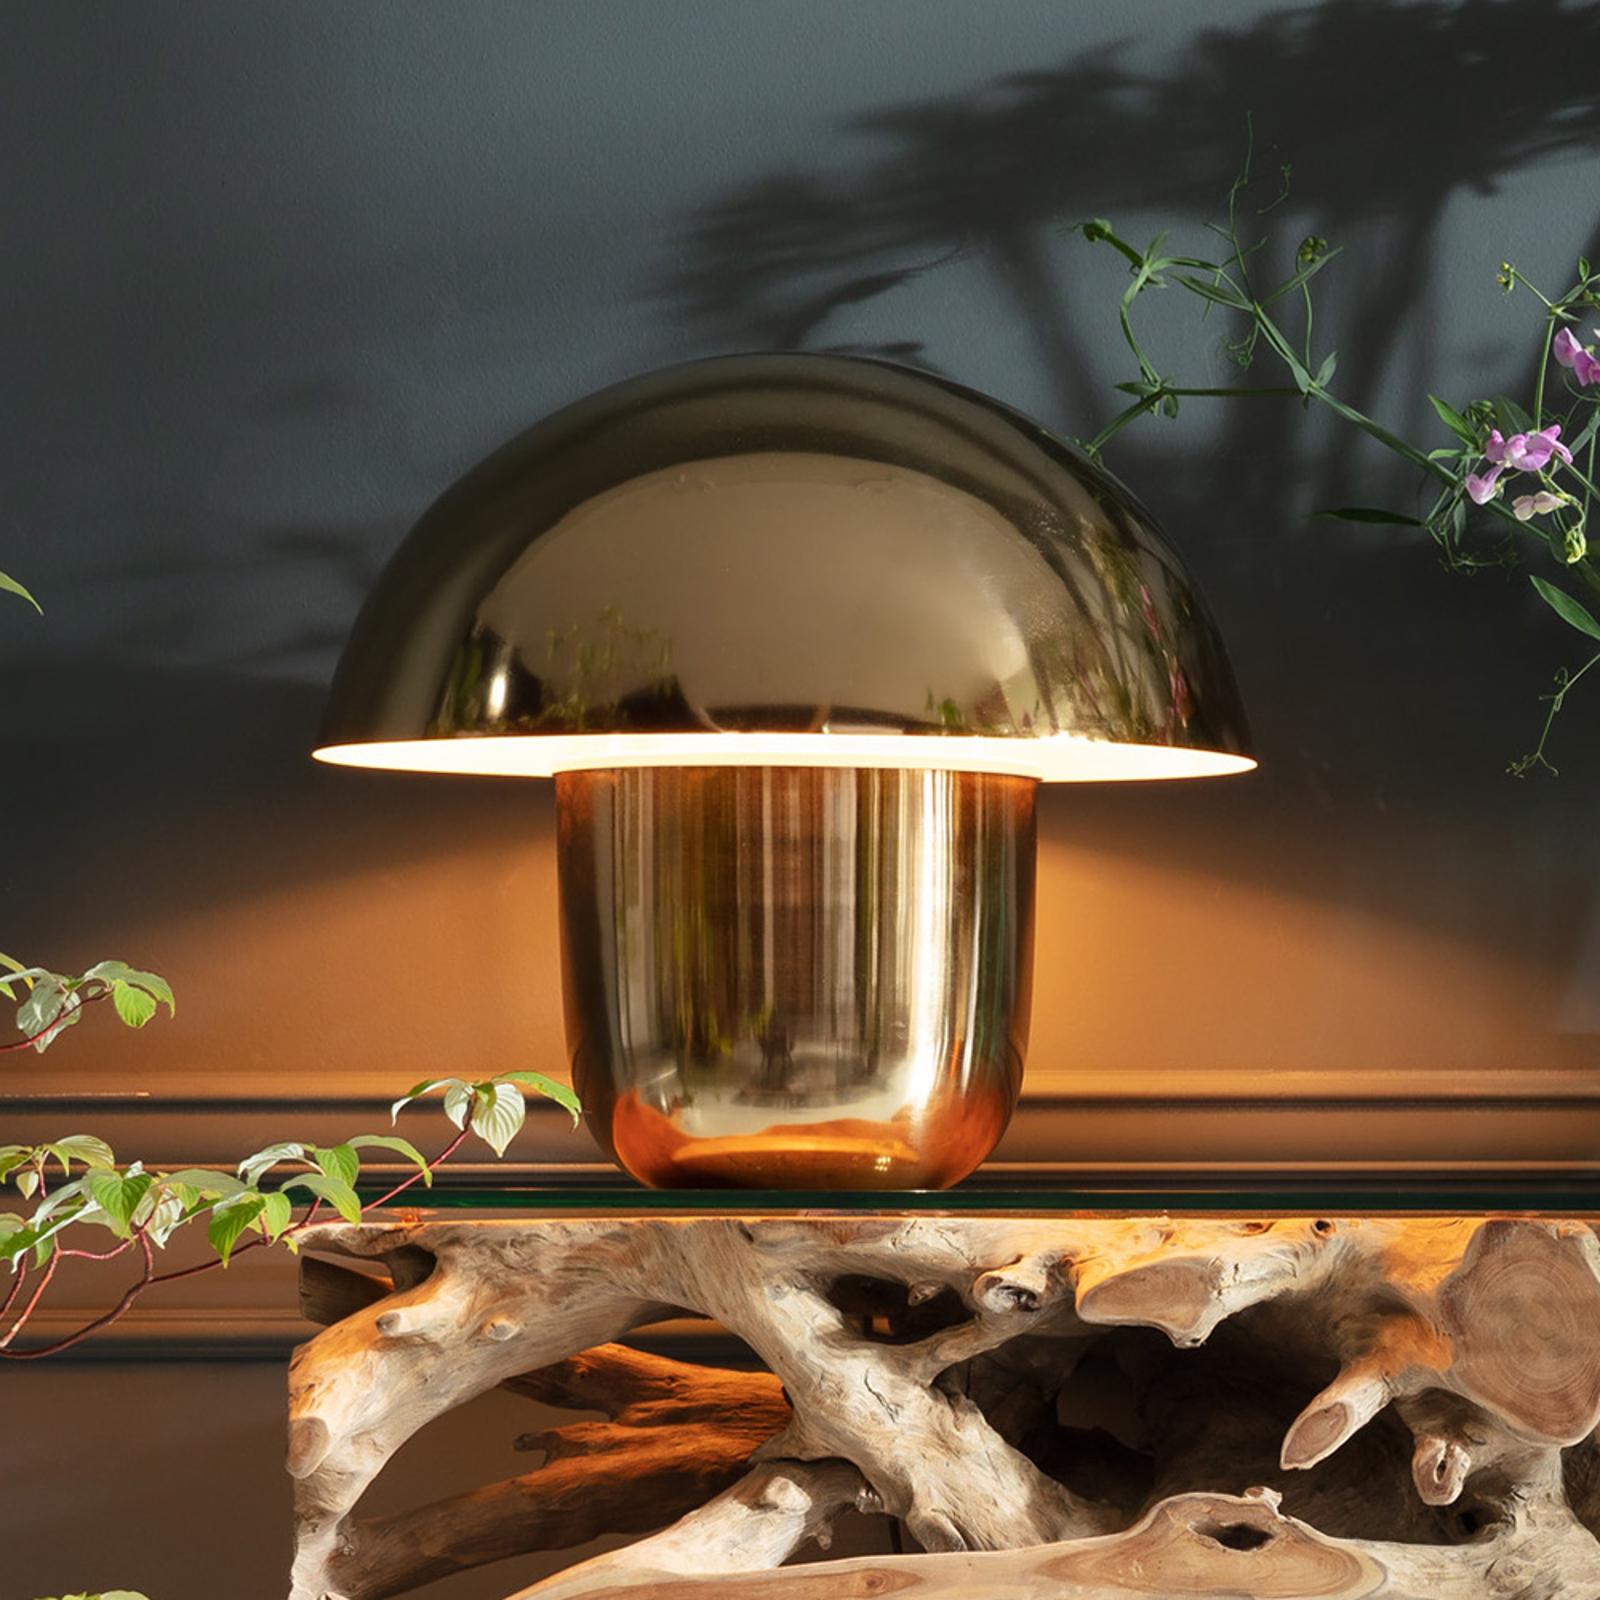 KARE Mushroom - lampe à poser originale, dorée